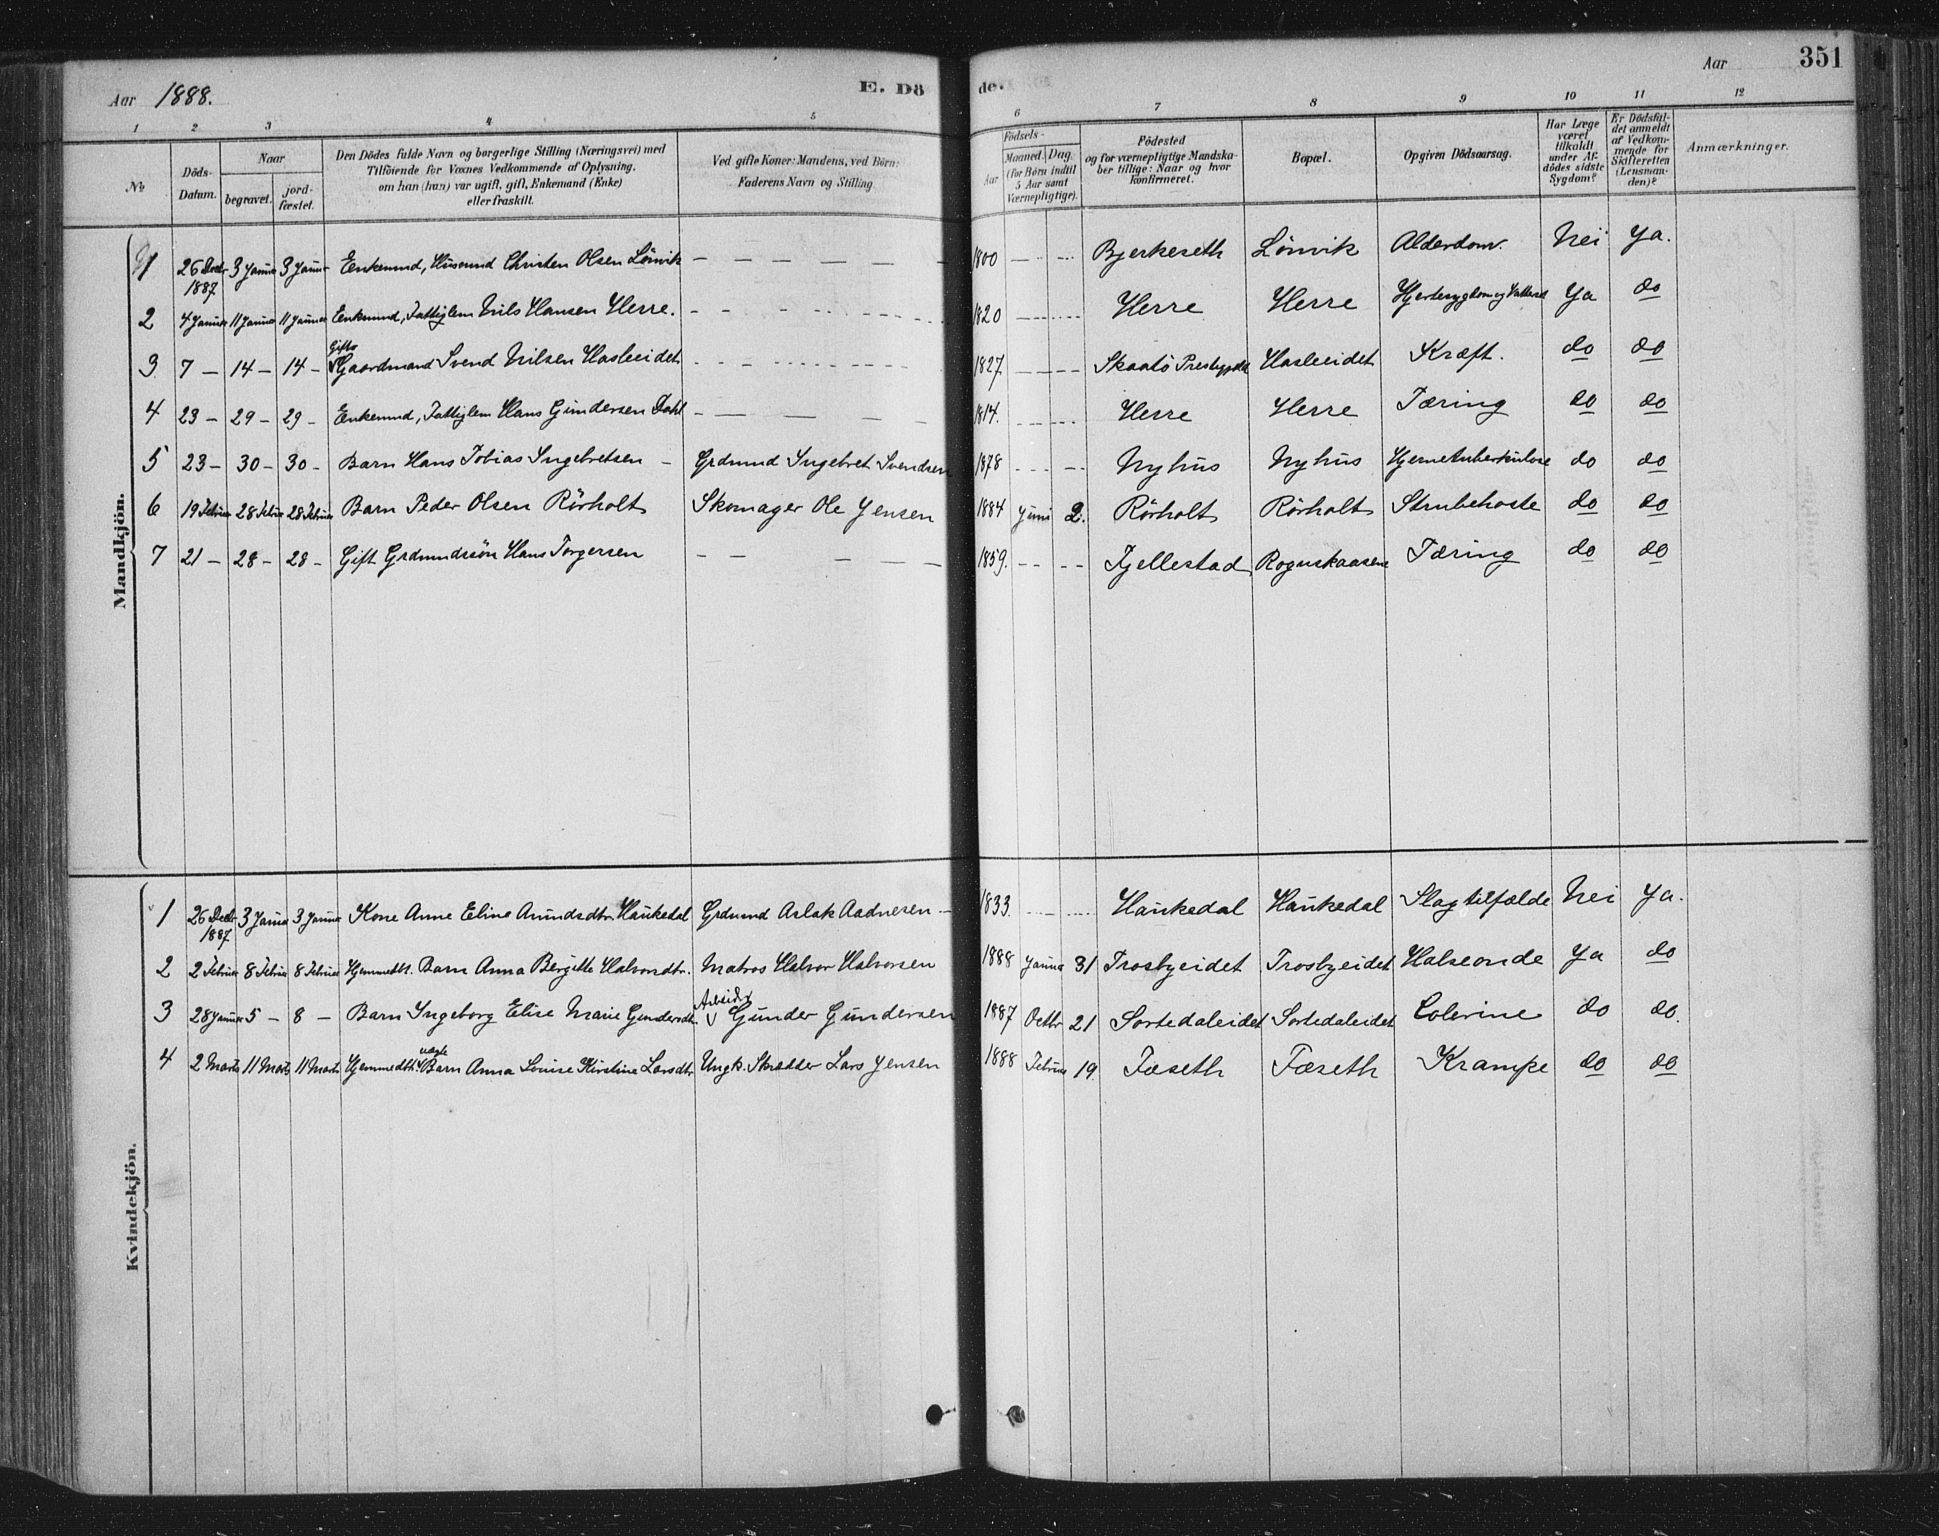 SAKO, Bamble kirkebøker, F/Fa/L0007: Ministerialbok nr. I 7, 1878-1888, s. 351